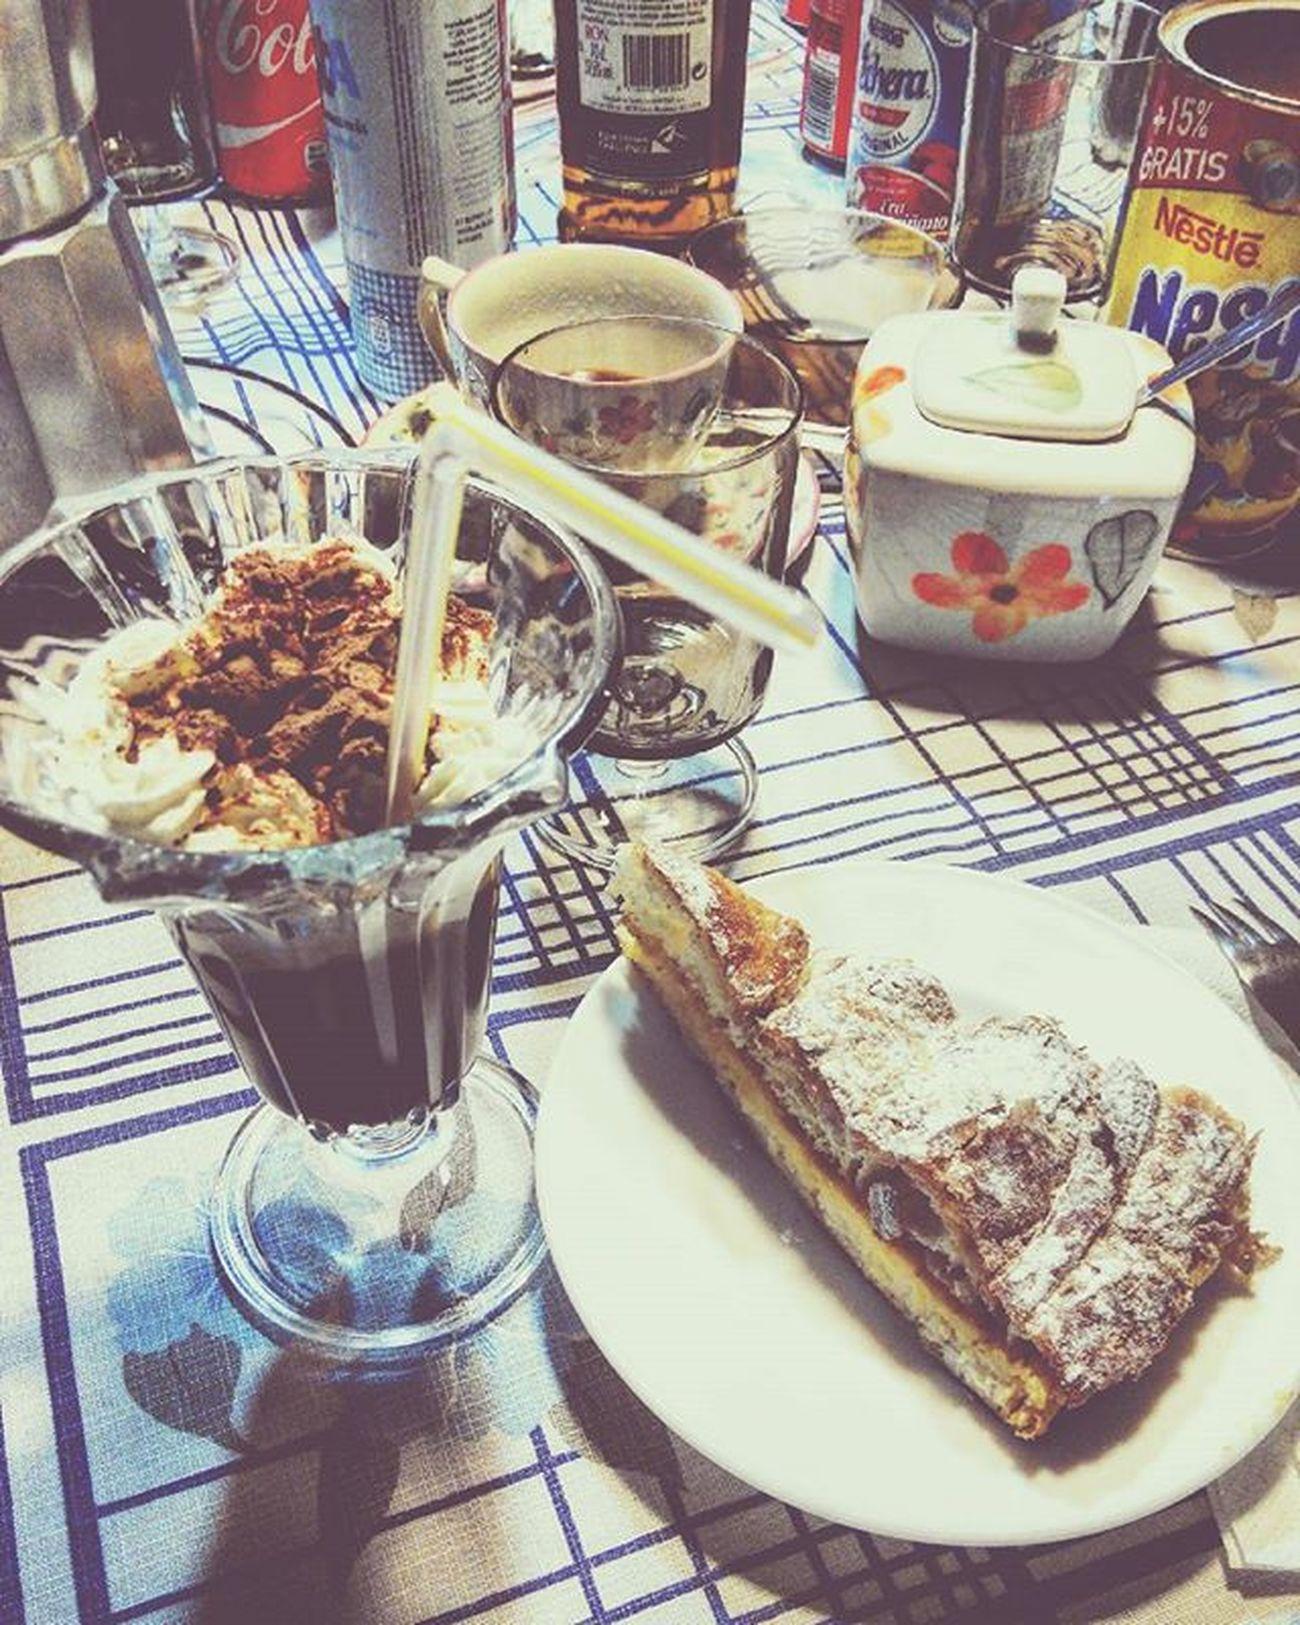 La Hora Del Cafe Jamaicano Coffe Ron Azúcar Nata Colacao Cocoa Chocolate Tarta Delicioso Delicatezen ñacñac Family Nice Cute Ibi SPAIN Domingo Frio 😚 Drink